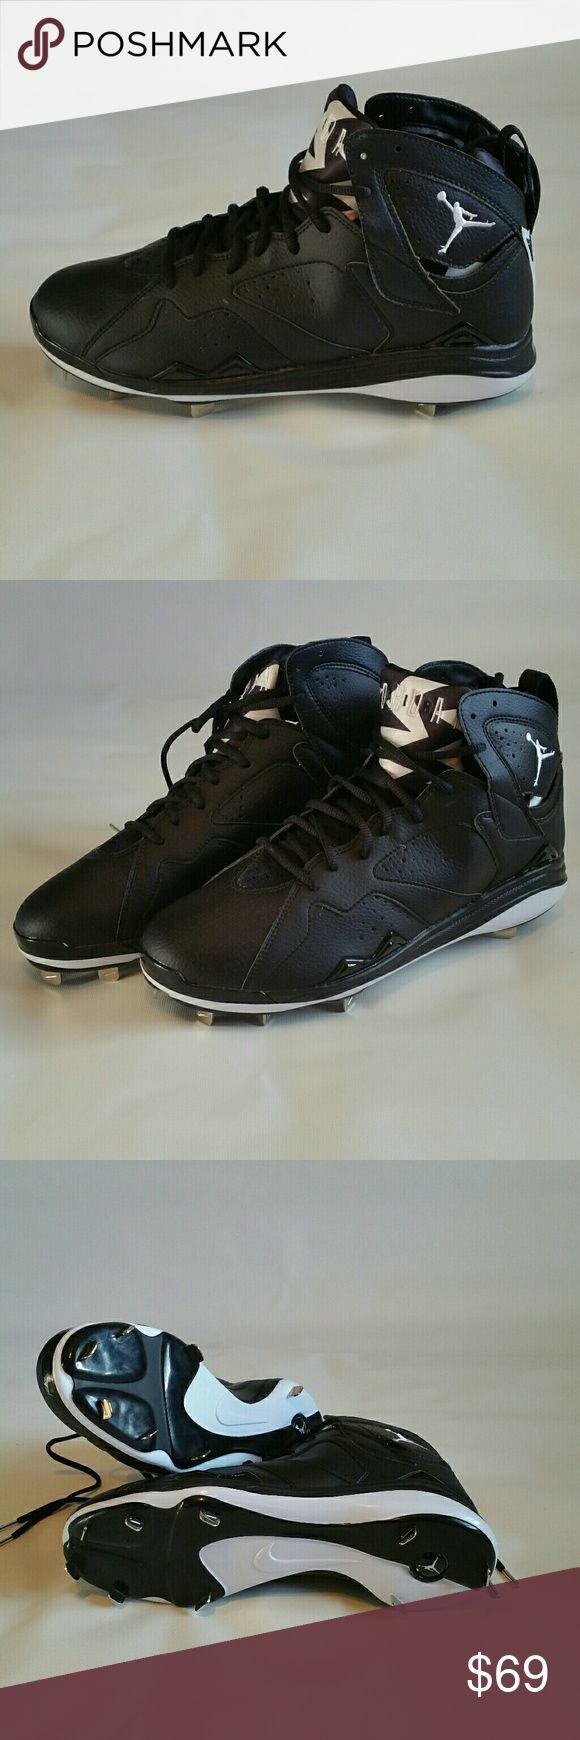 Nike Air Jordan VII Metal Baseball Cleats Sz 12 NWOB. Retail purchase size 12 Nike Shoes Athletic Shoes